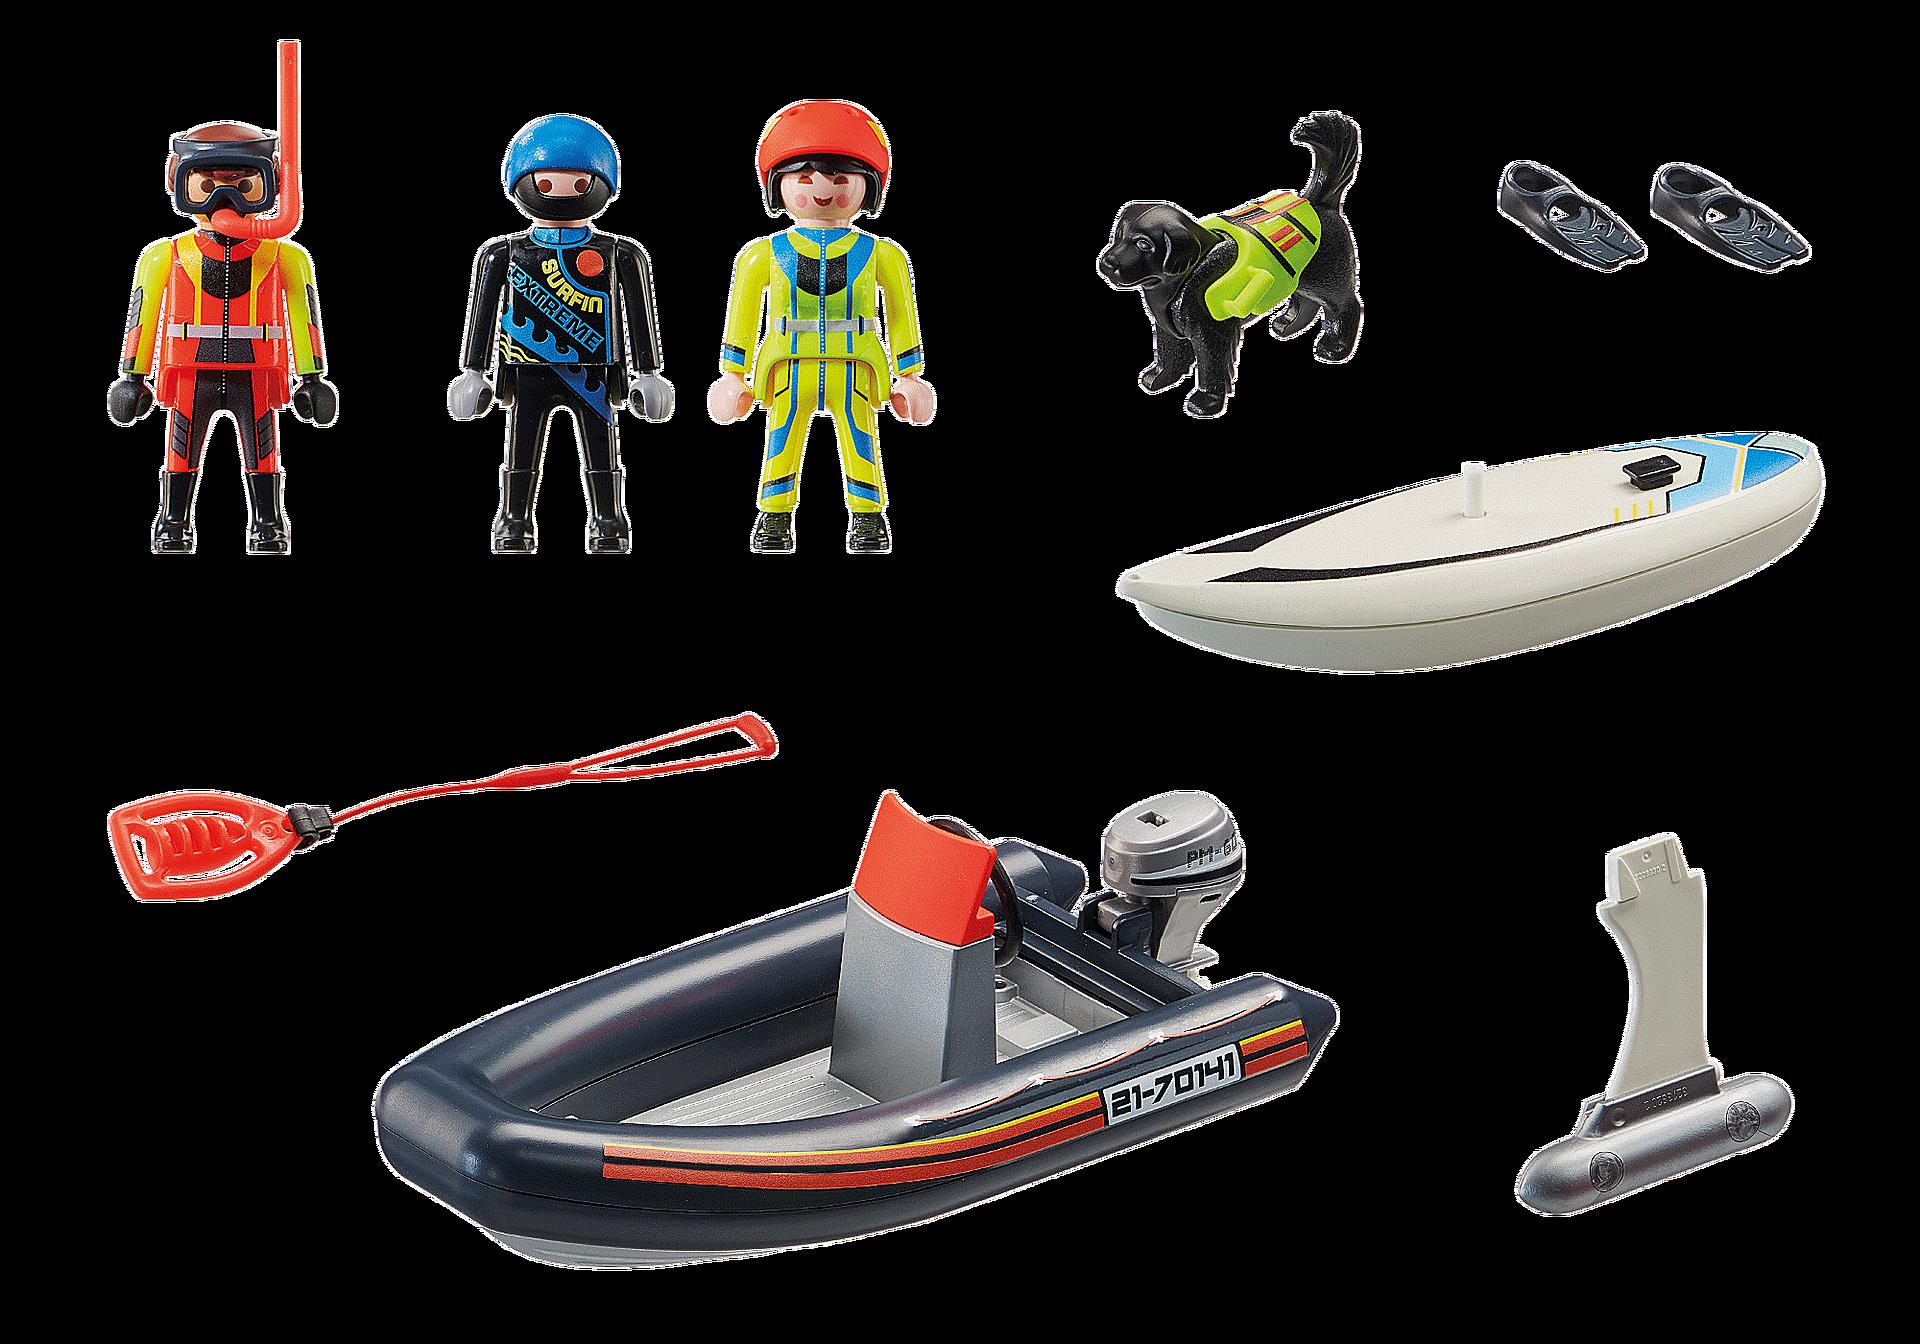 70141 Sjönöd: Polarräddare med gummibåt zoom image3